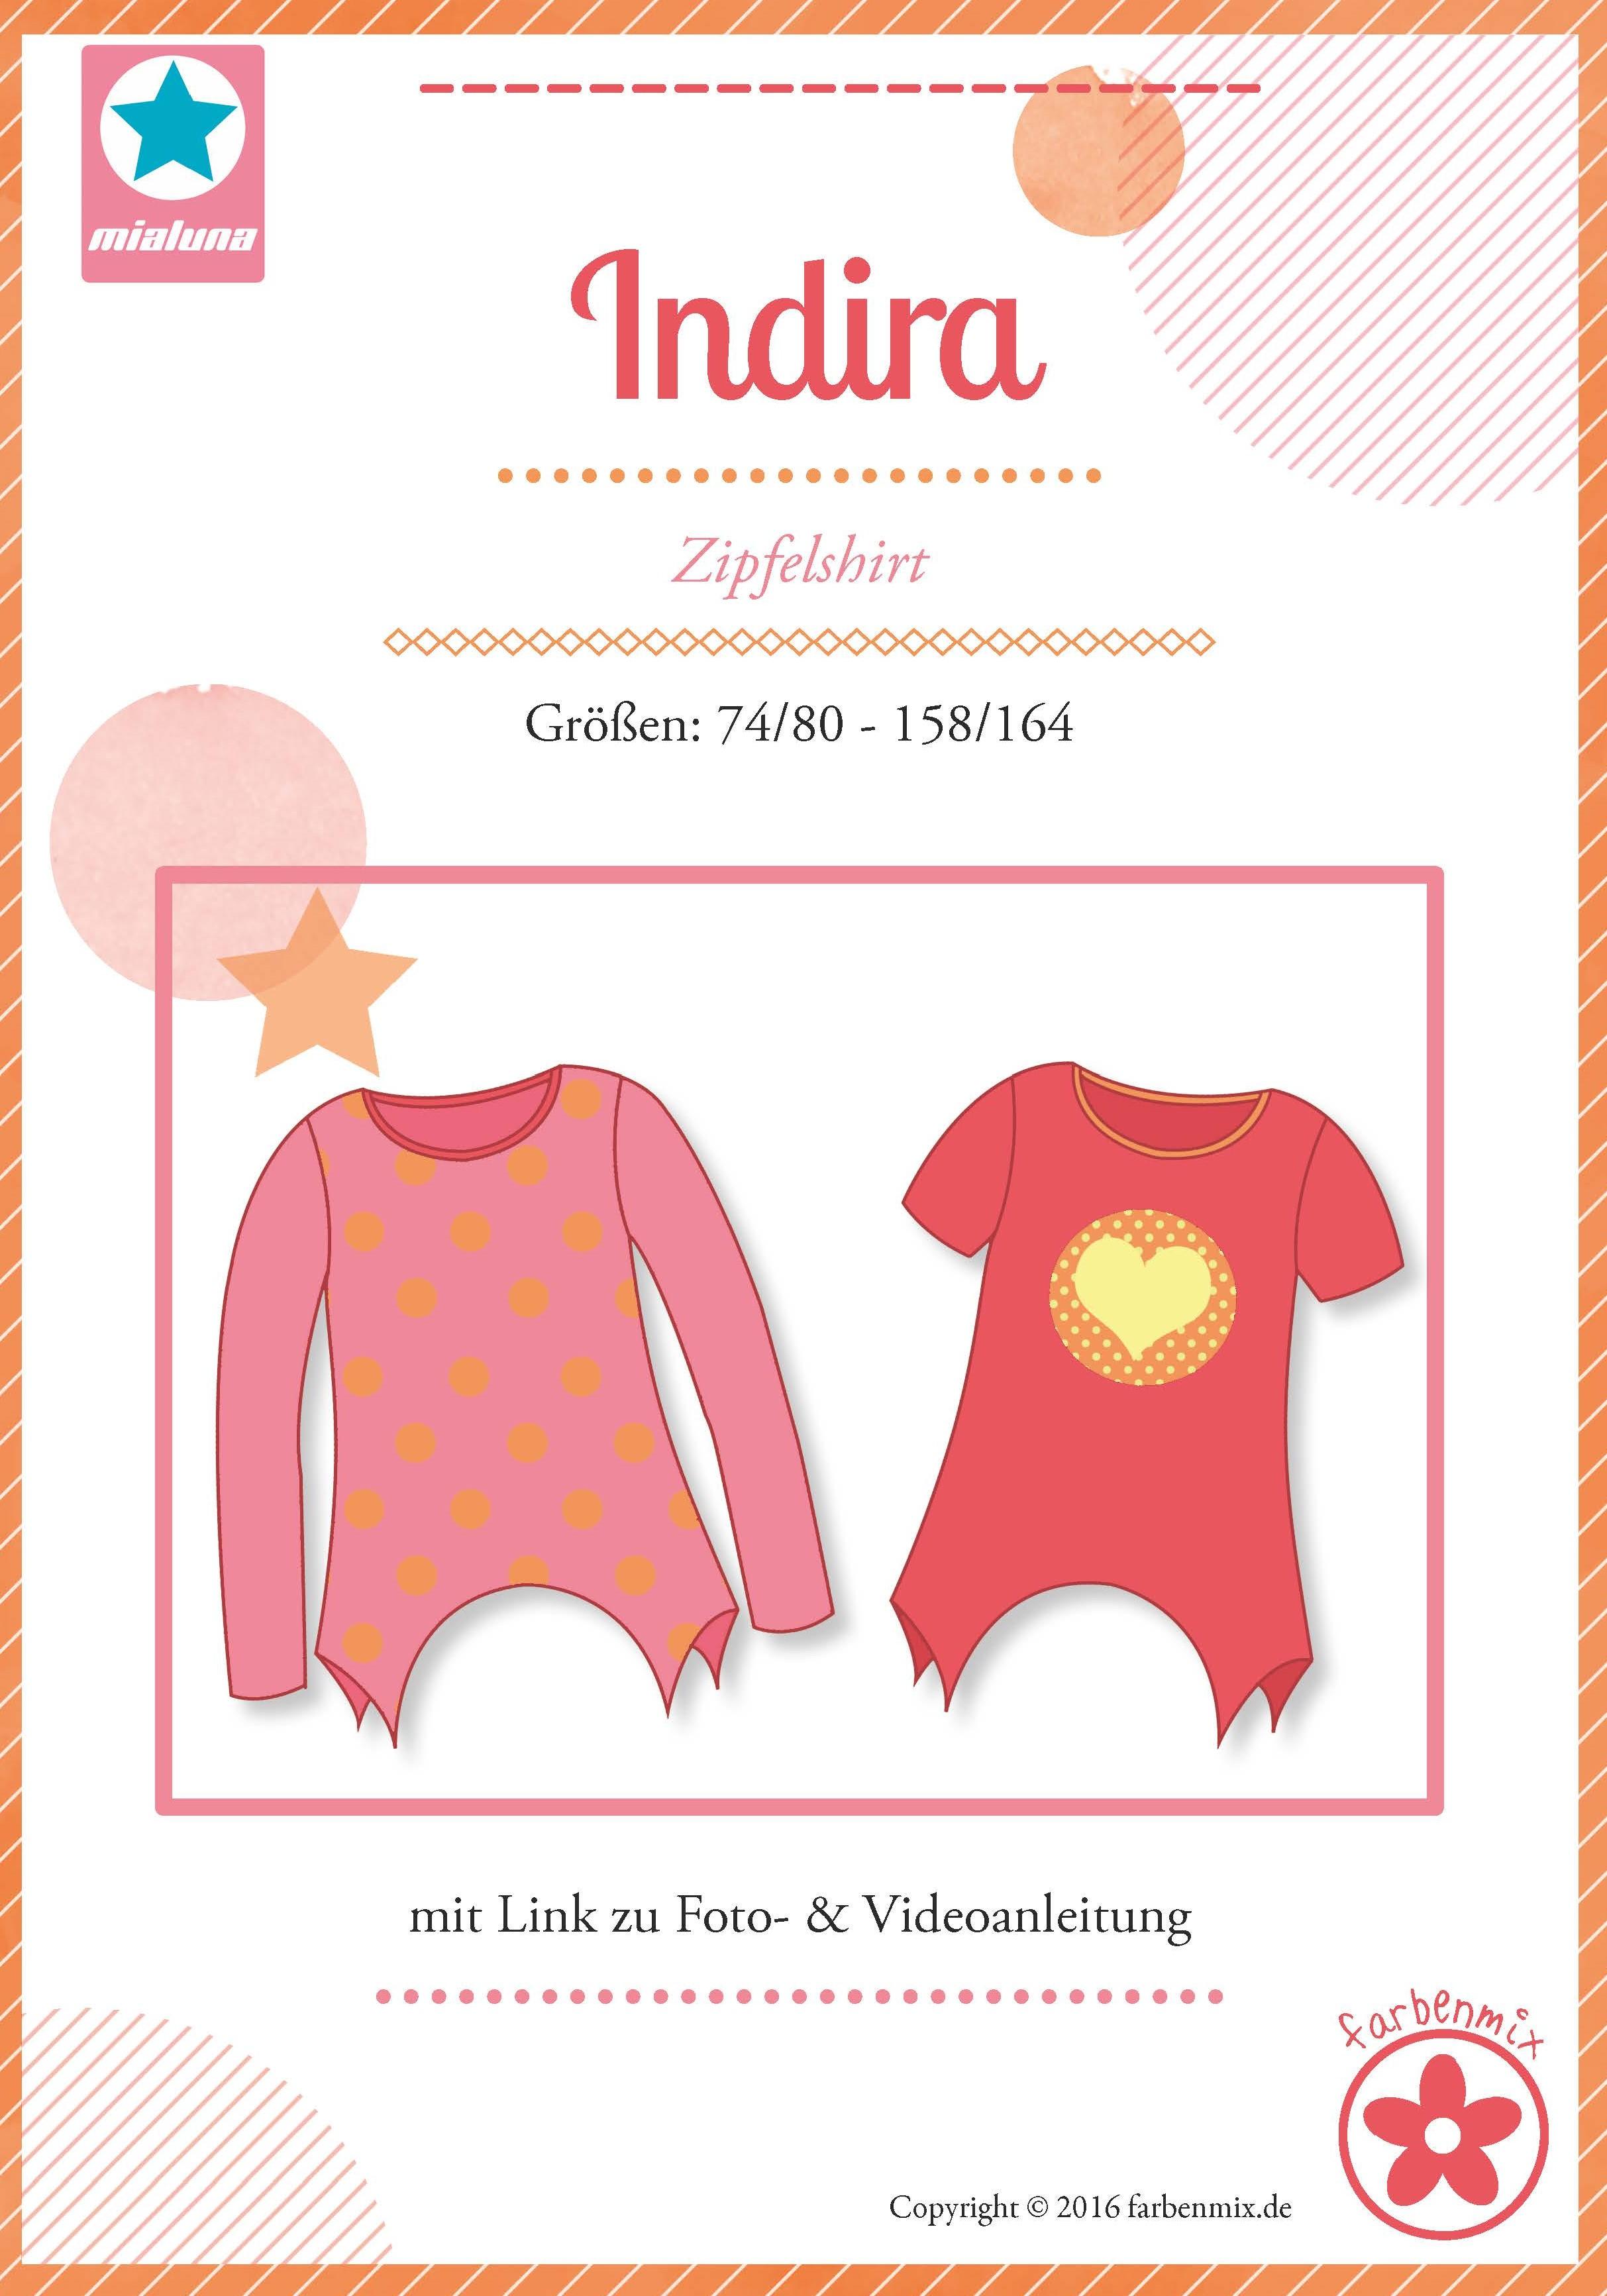 Indira, Zipfelshirt, Papierschnittmuster | Kinderschnitte ...